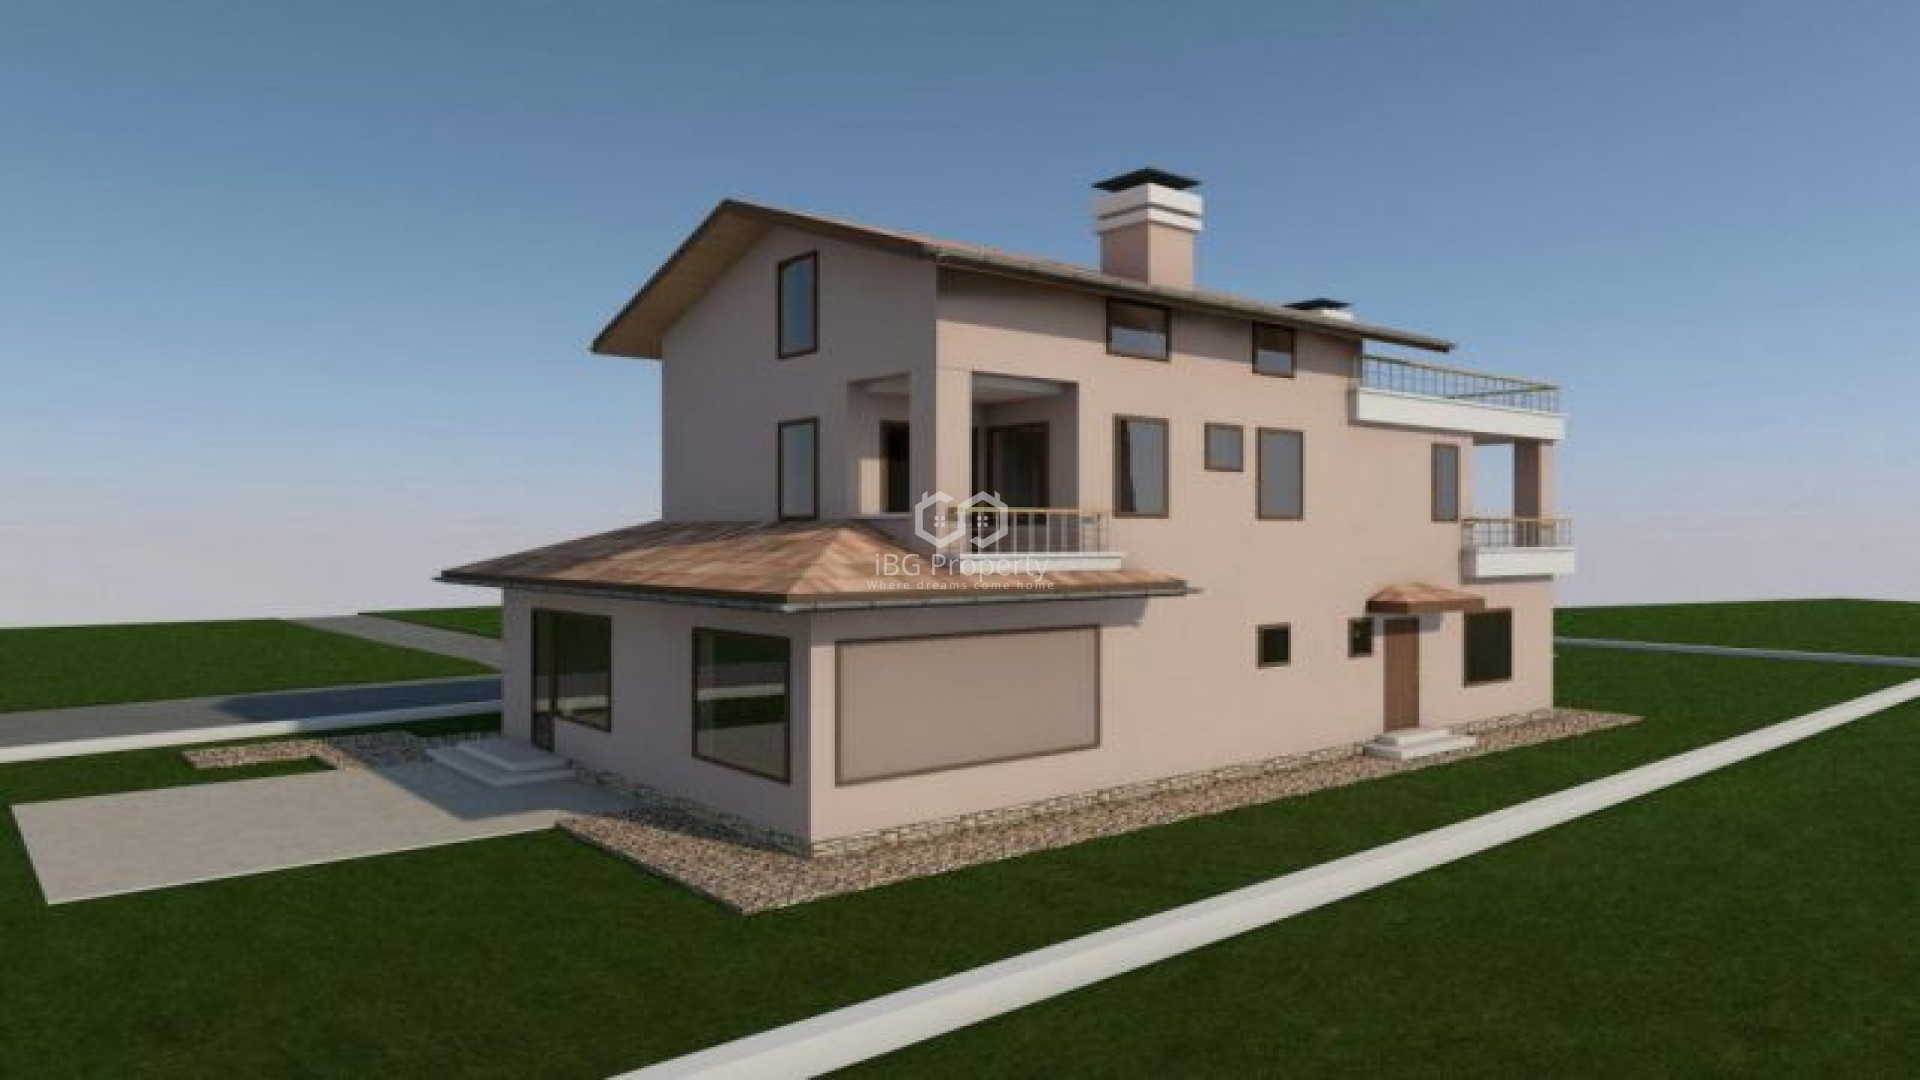 House Borovets Varna 243 m2